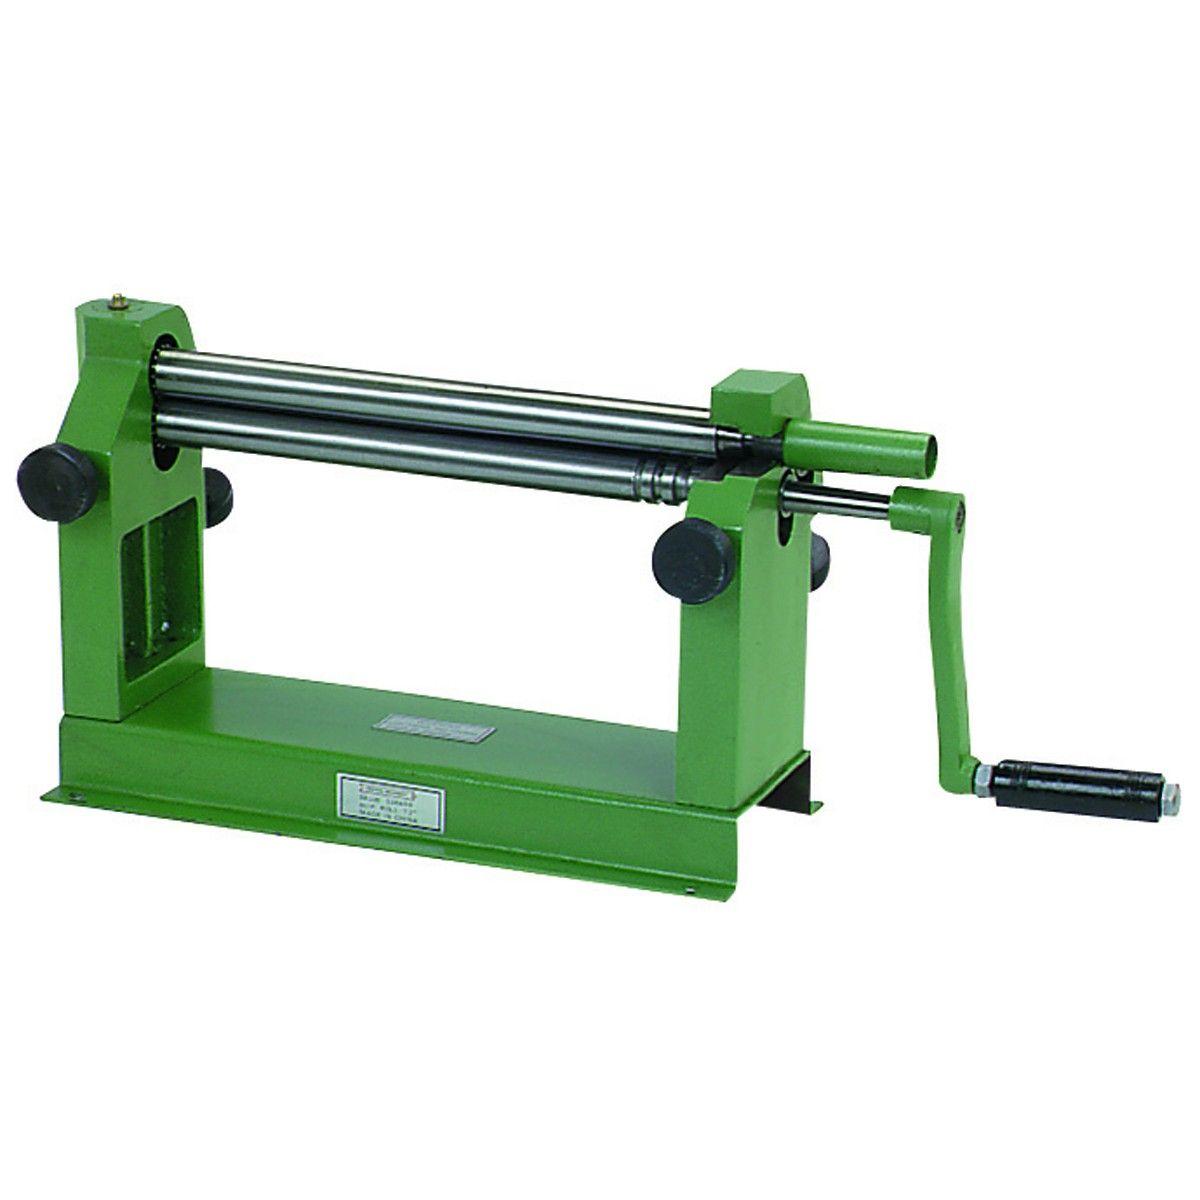 12 x 20 gauge slip roll metalworking pinterest gauges and 12 x 20 gauge slip roll greentooth Images